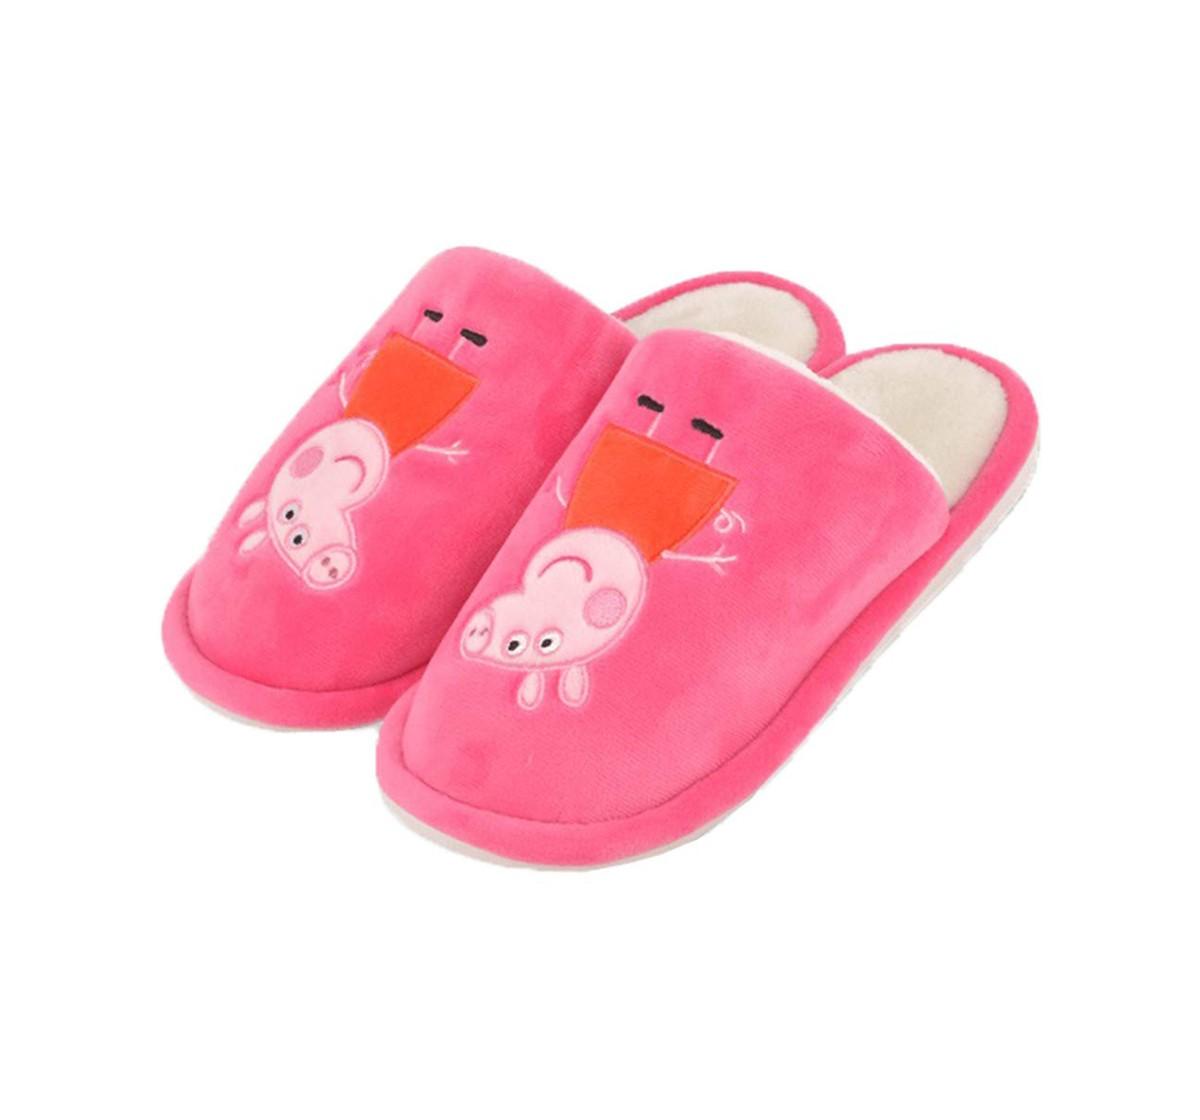 Peppa Pig Slipper Plush Accessory for Girls age 3Y+ 19 Cm (Pink)